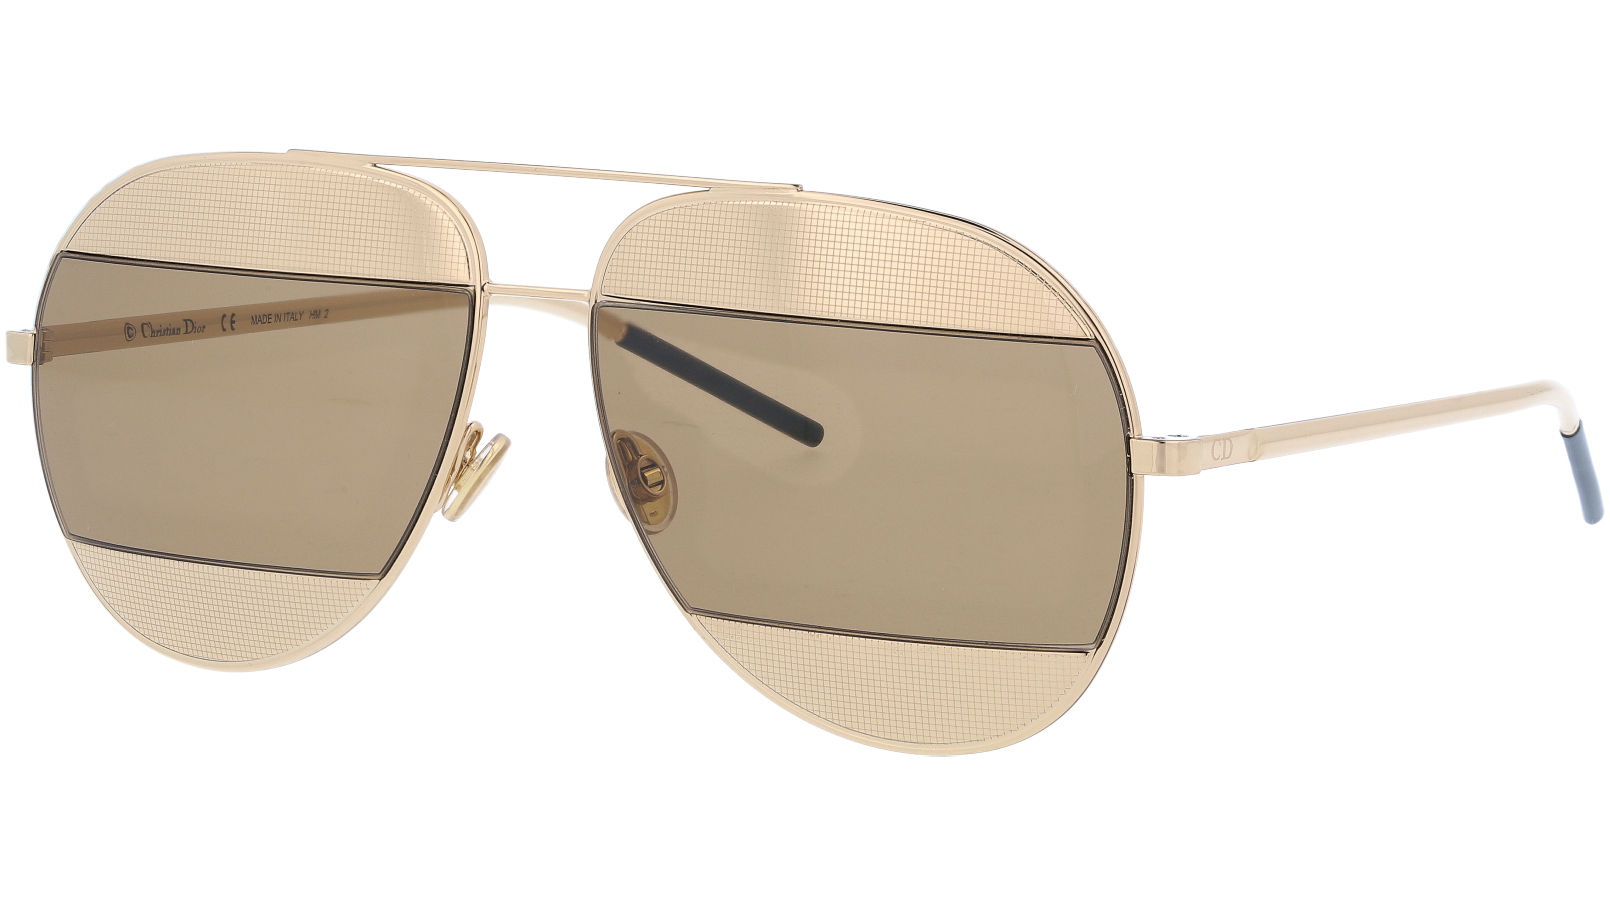 Dior SPLIT1 0103J 59 Palladium Sunglasses